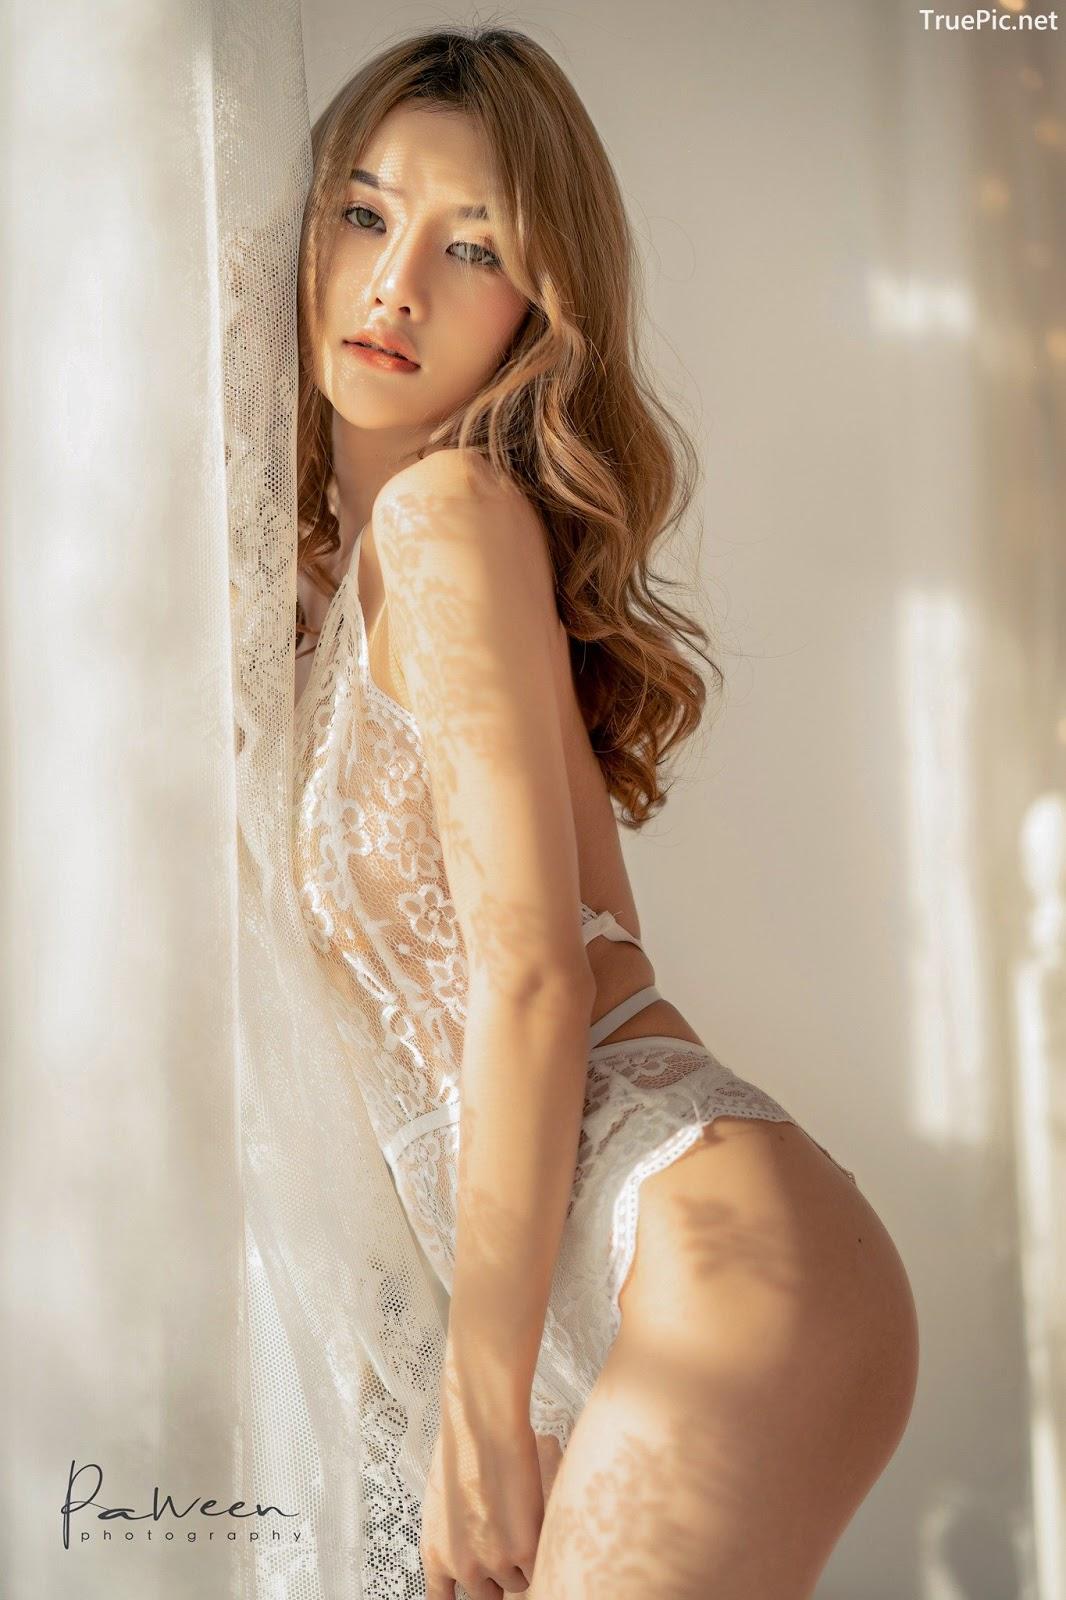 Image Thailand Model - Atittaya Chaiyasing - White Lace Lingerie - TruePic.net - Picture-14